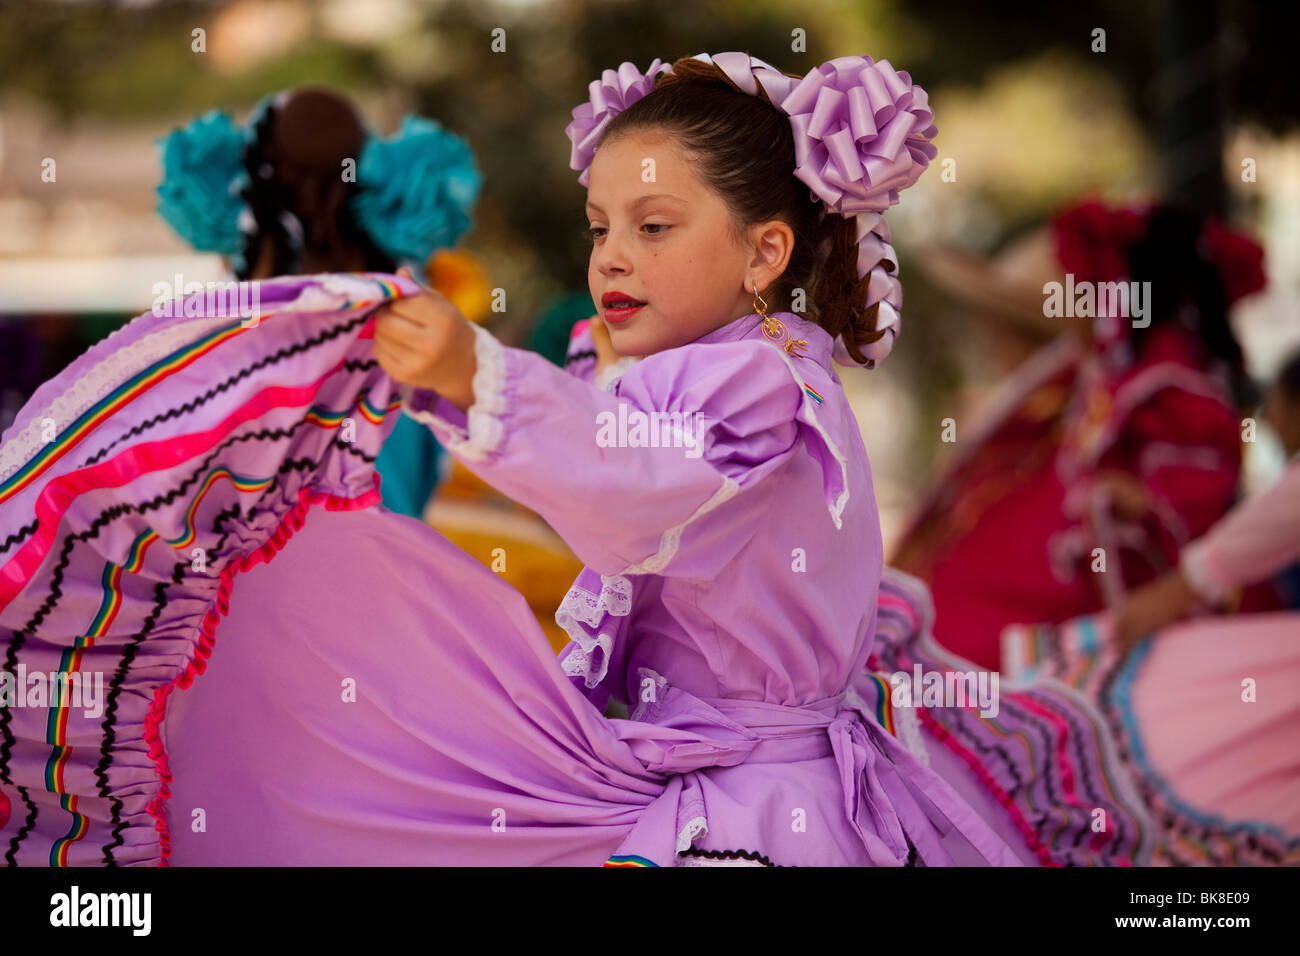 Latino Dance Imágenes De Stock & Latino Dance Fotos De Stock - Alamy